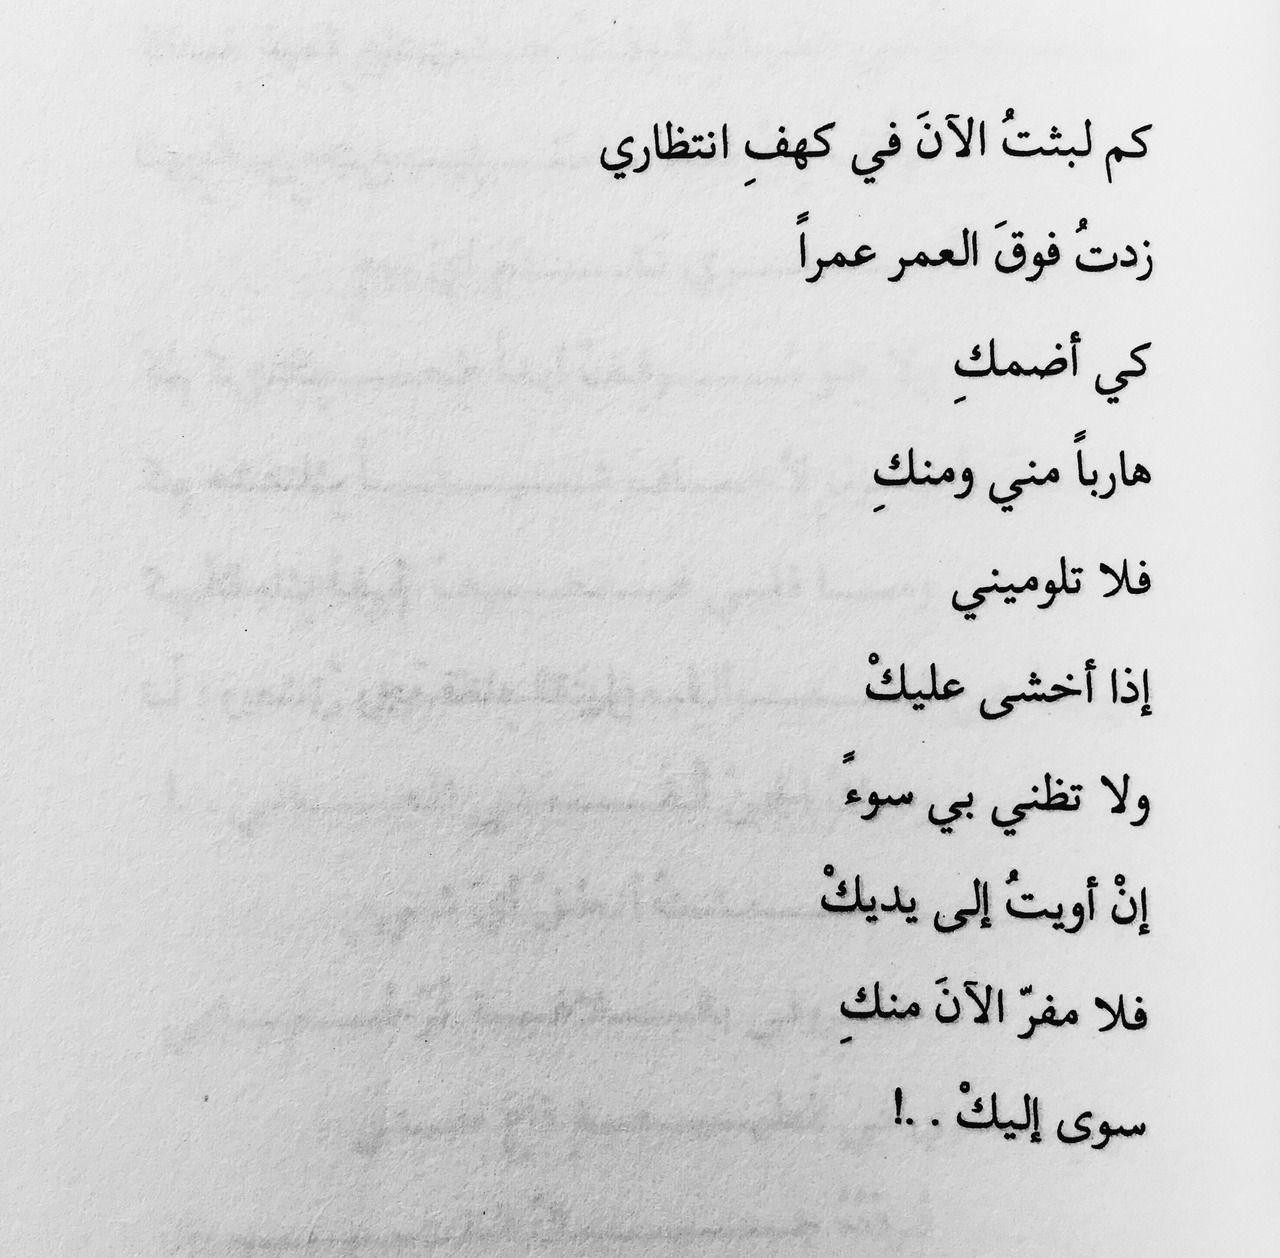 جلالة السيد غياب ماجد مقبل Cover Photo Quotes Photo Quotes Quotes